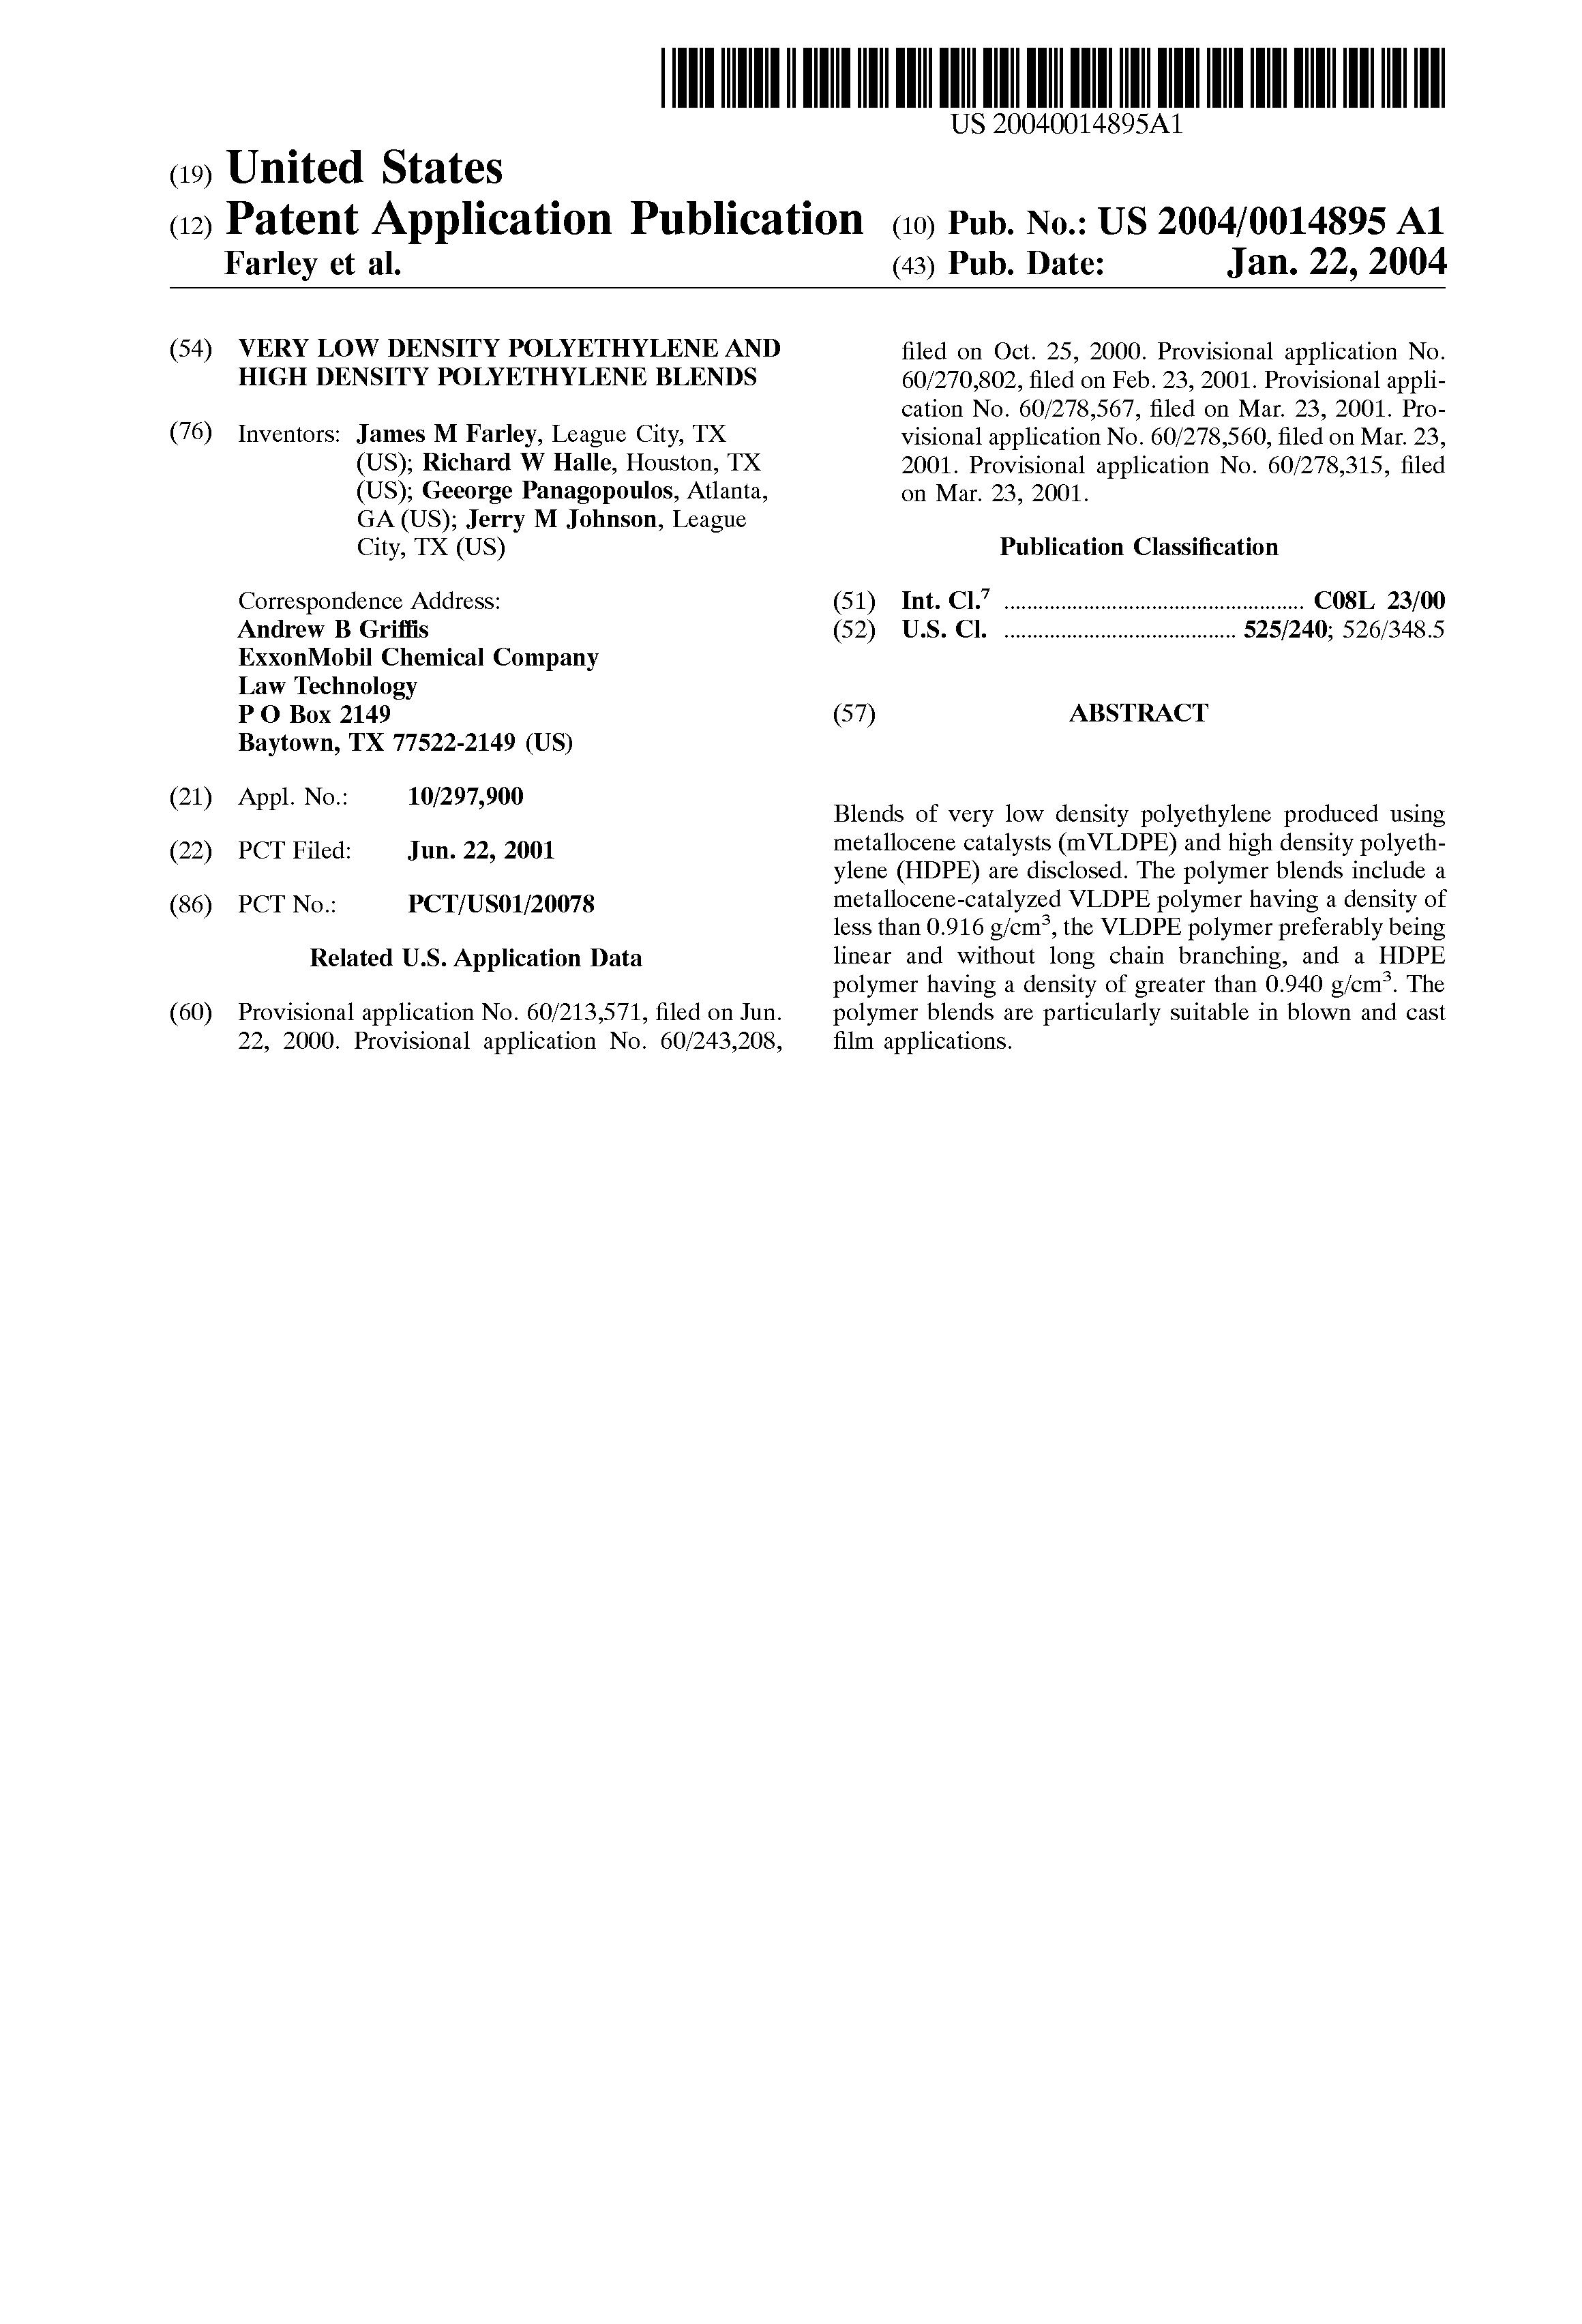 US 2004/0014895 A1 - Very Low Density Polyethylene And High Density